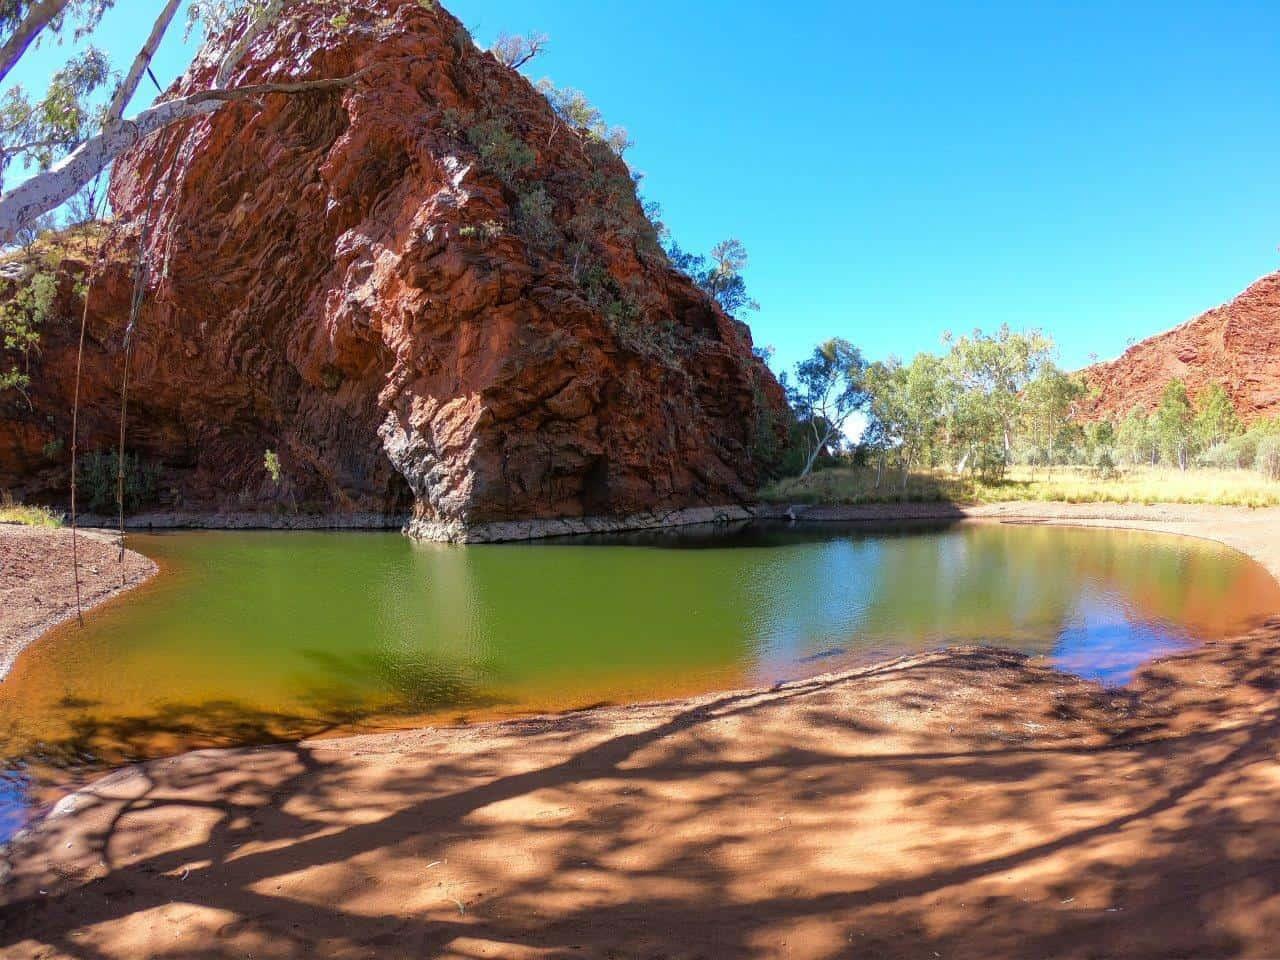 Kalgan S Pool In The Pilbara The Best Free Camp We Ve